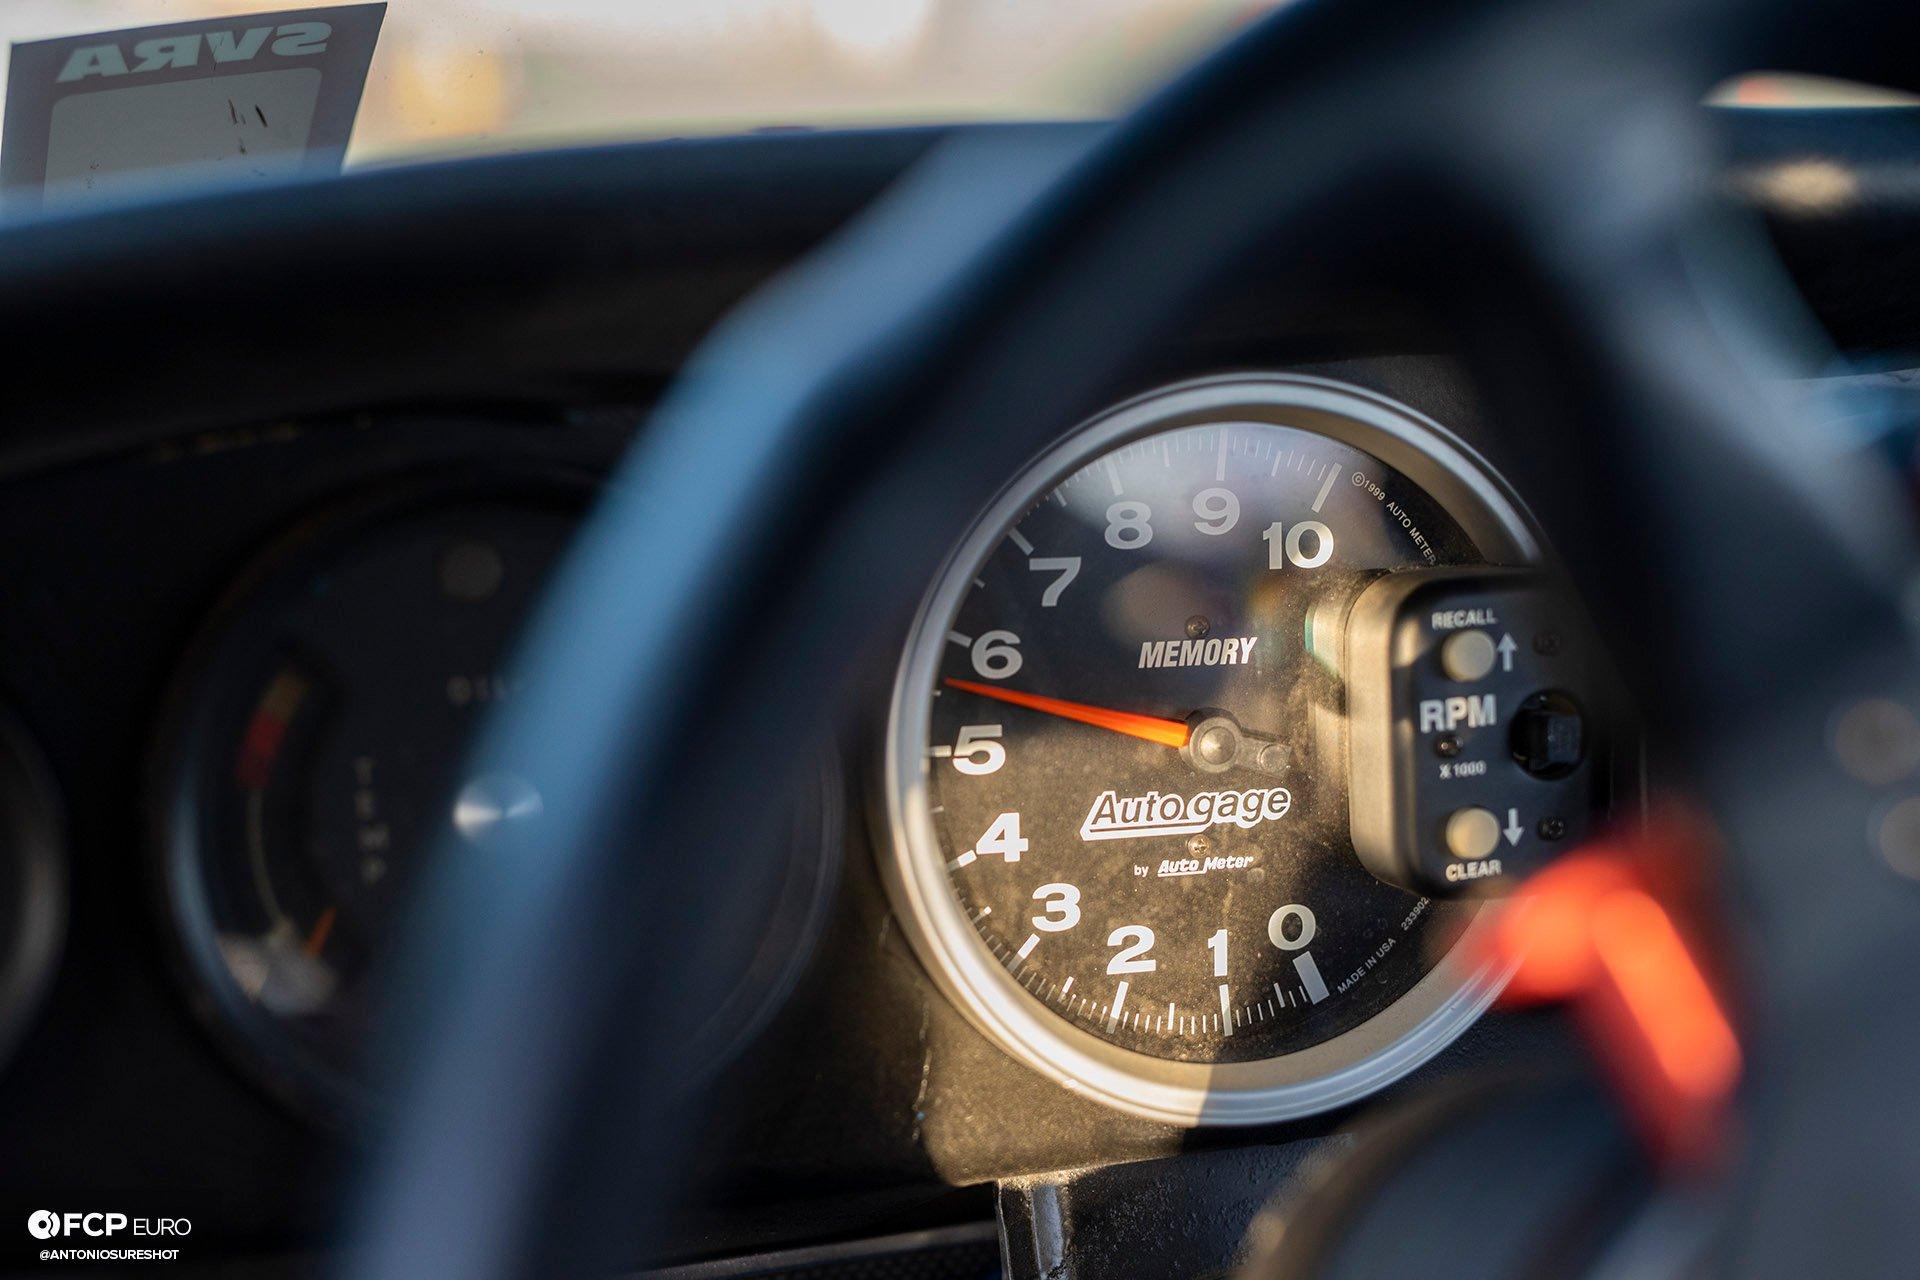 Porsche 911 Longnose VARA Patrick Long Chad Plavan EOSR9415